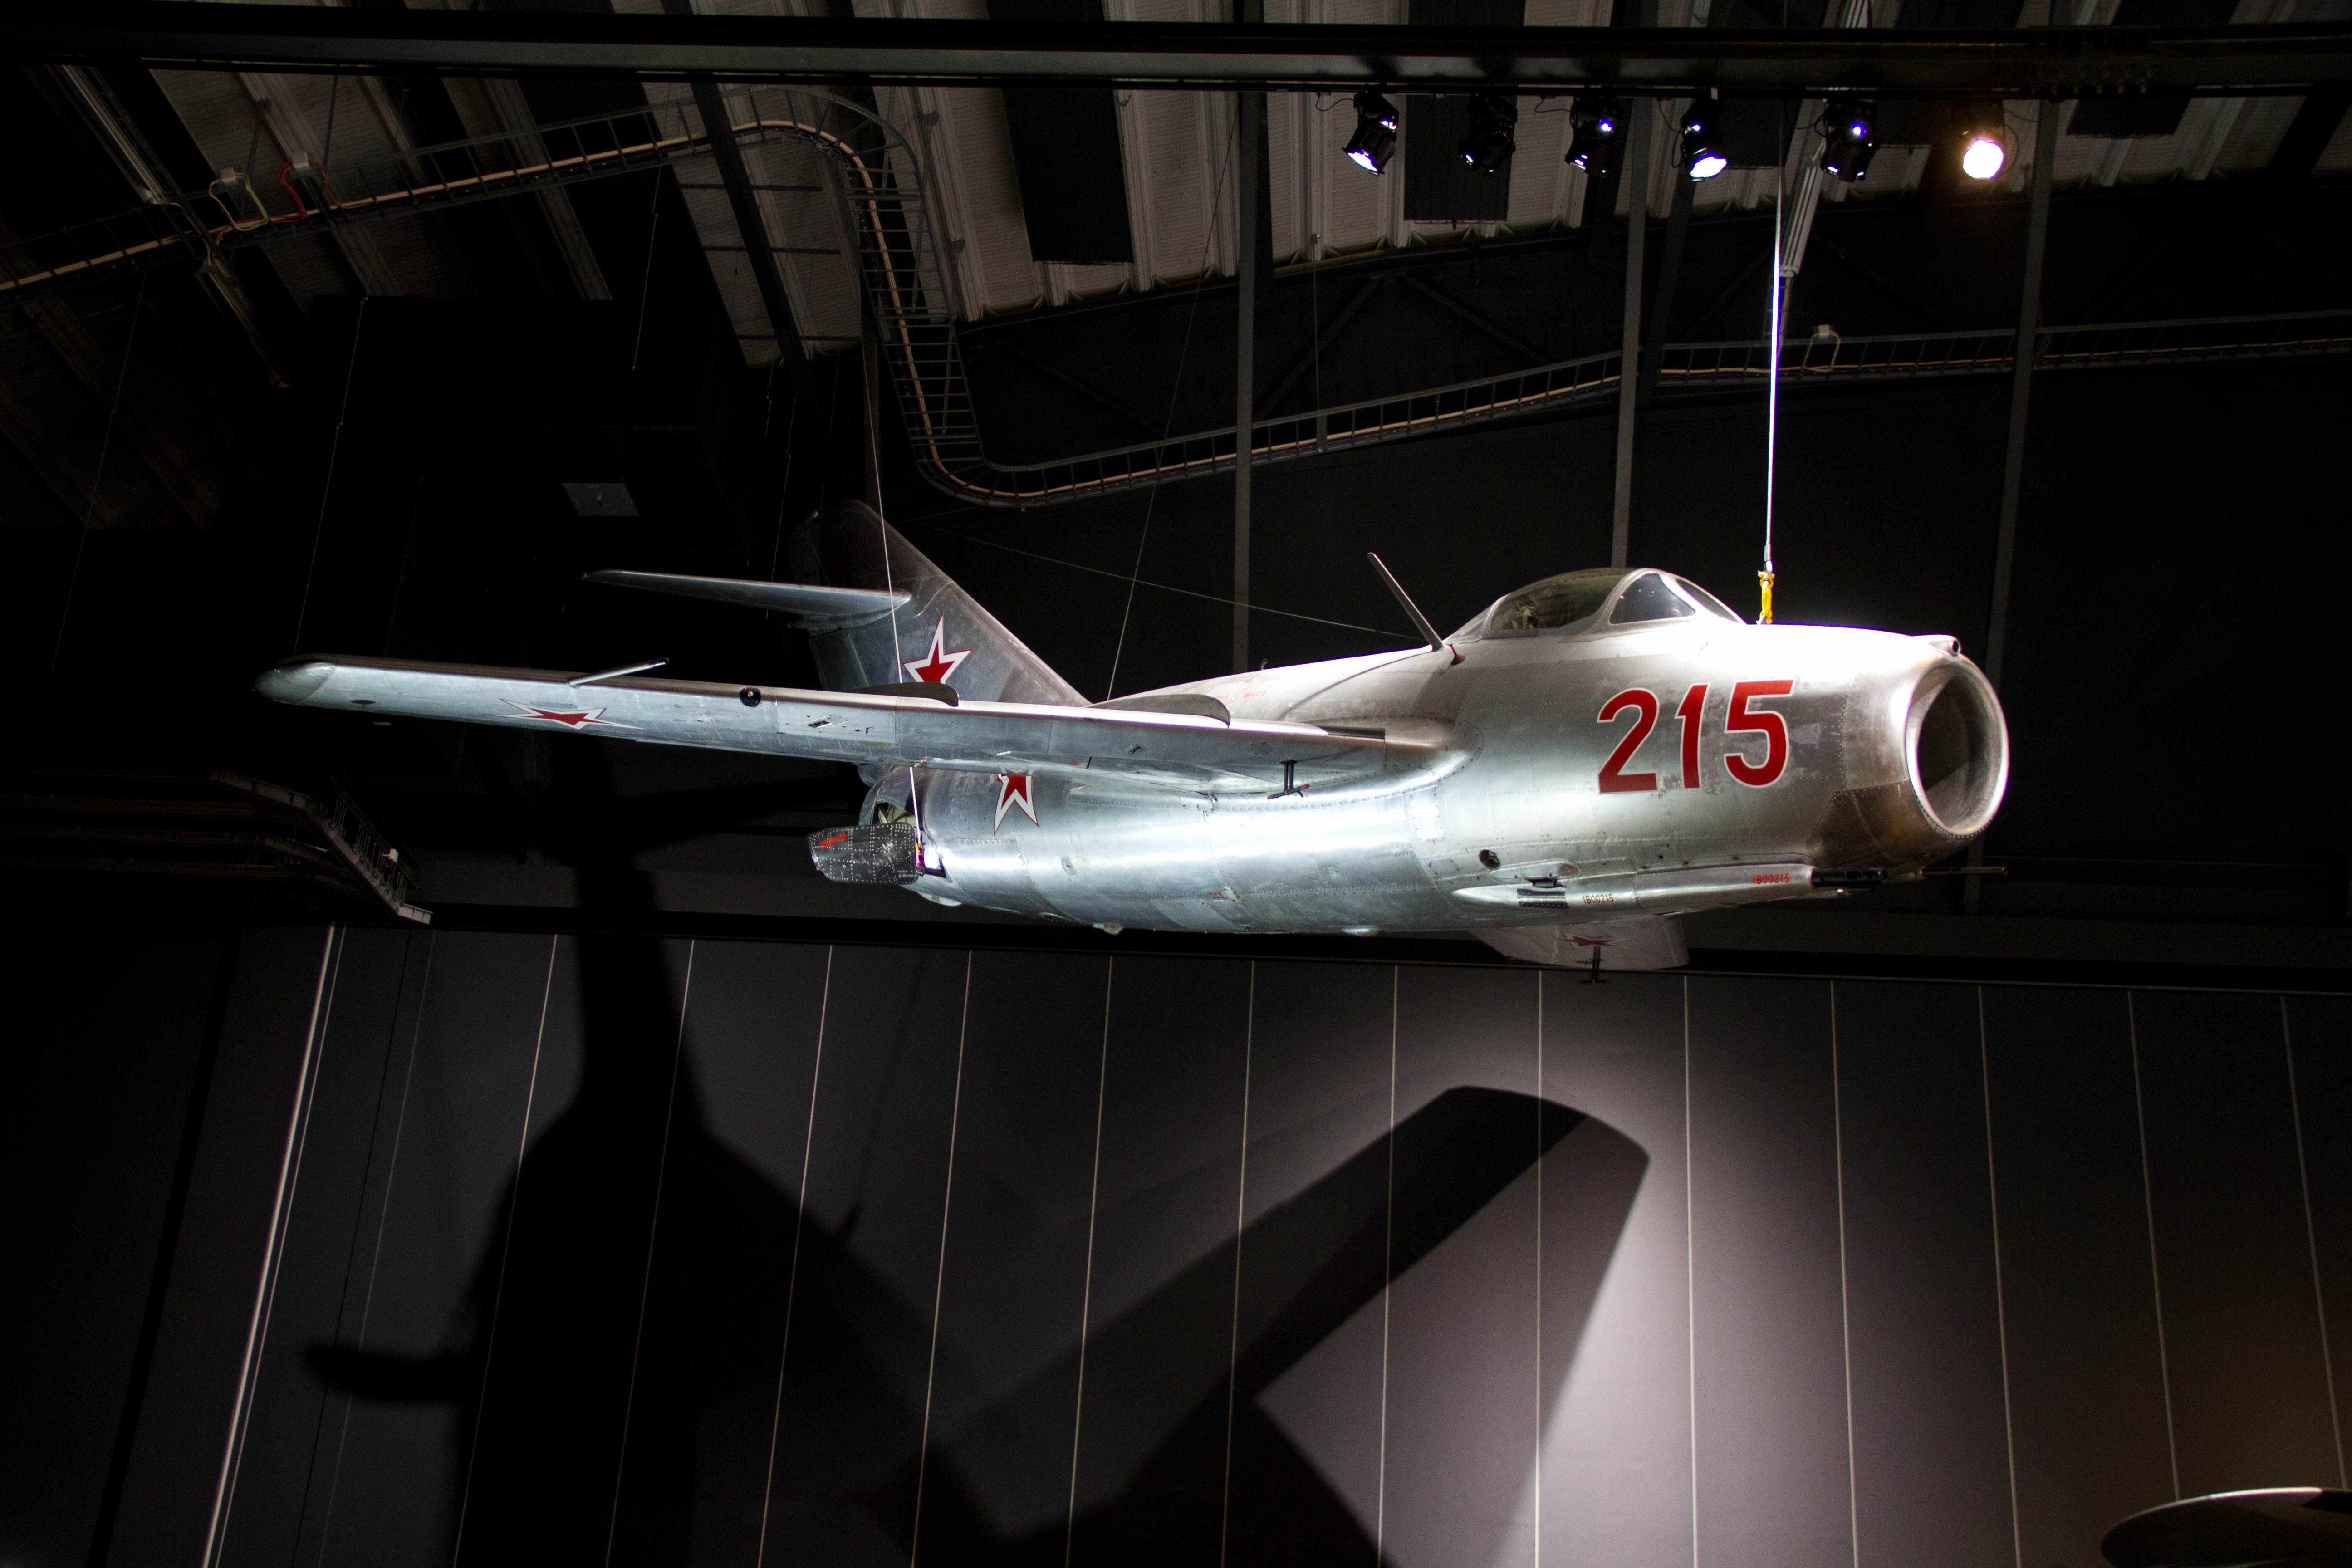 flygvapenmuseum linköping